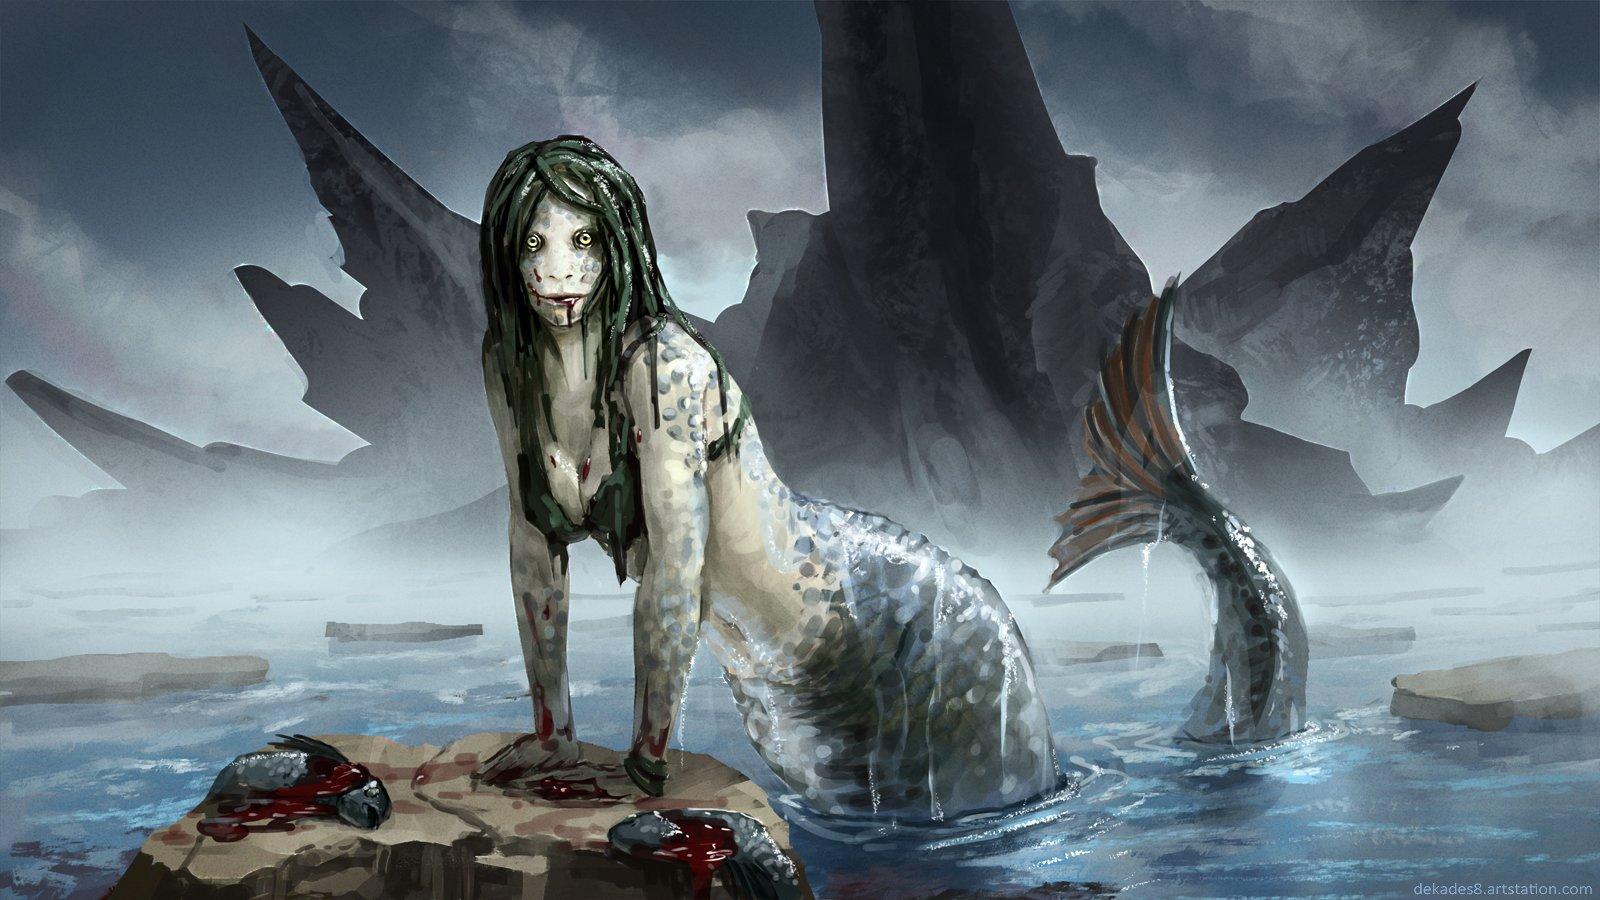 Dmitry desyatov mermaid 2